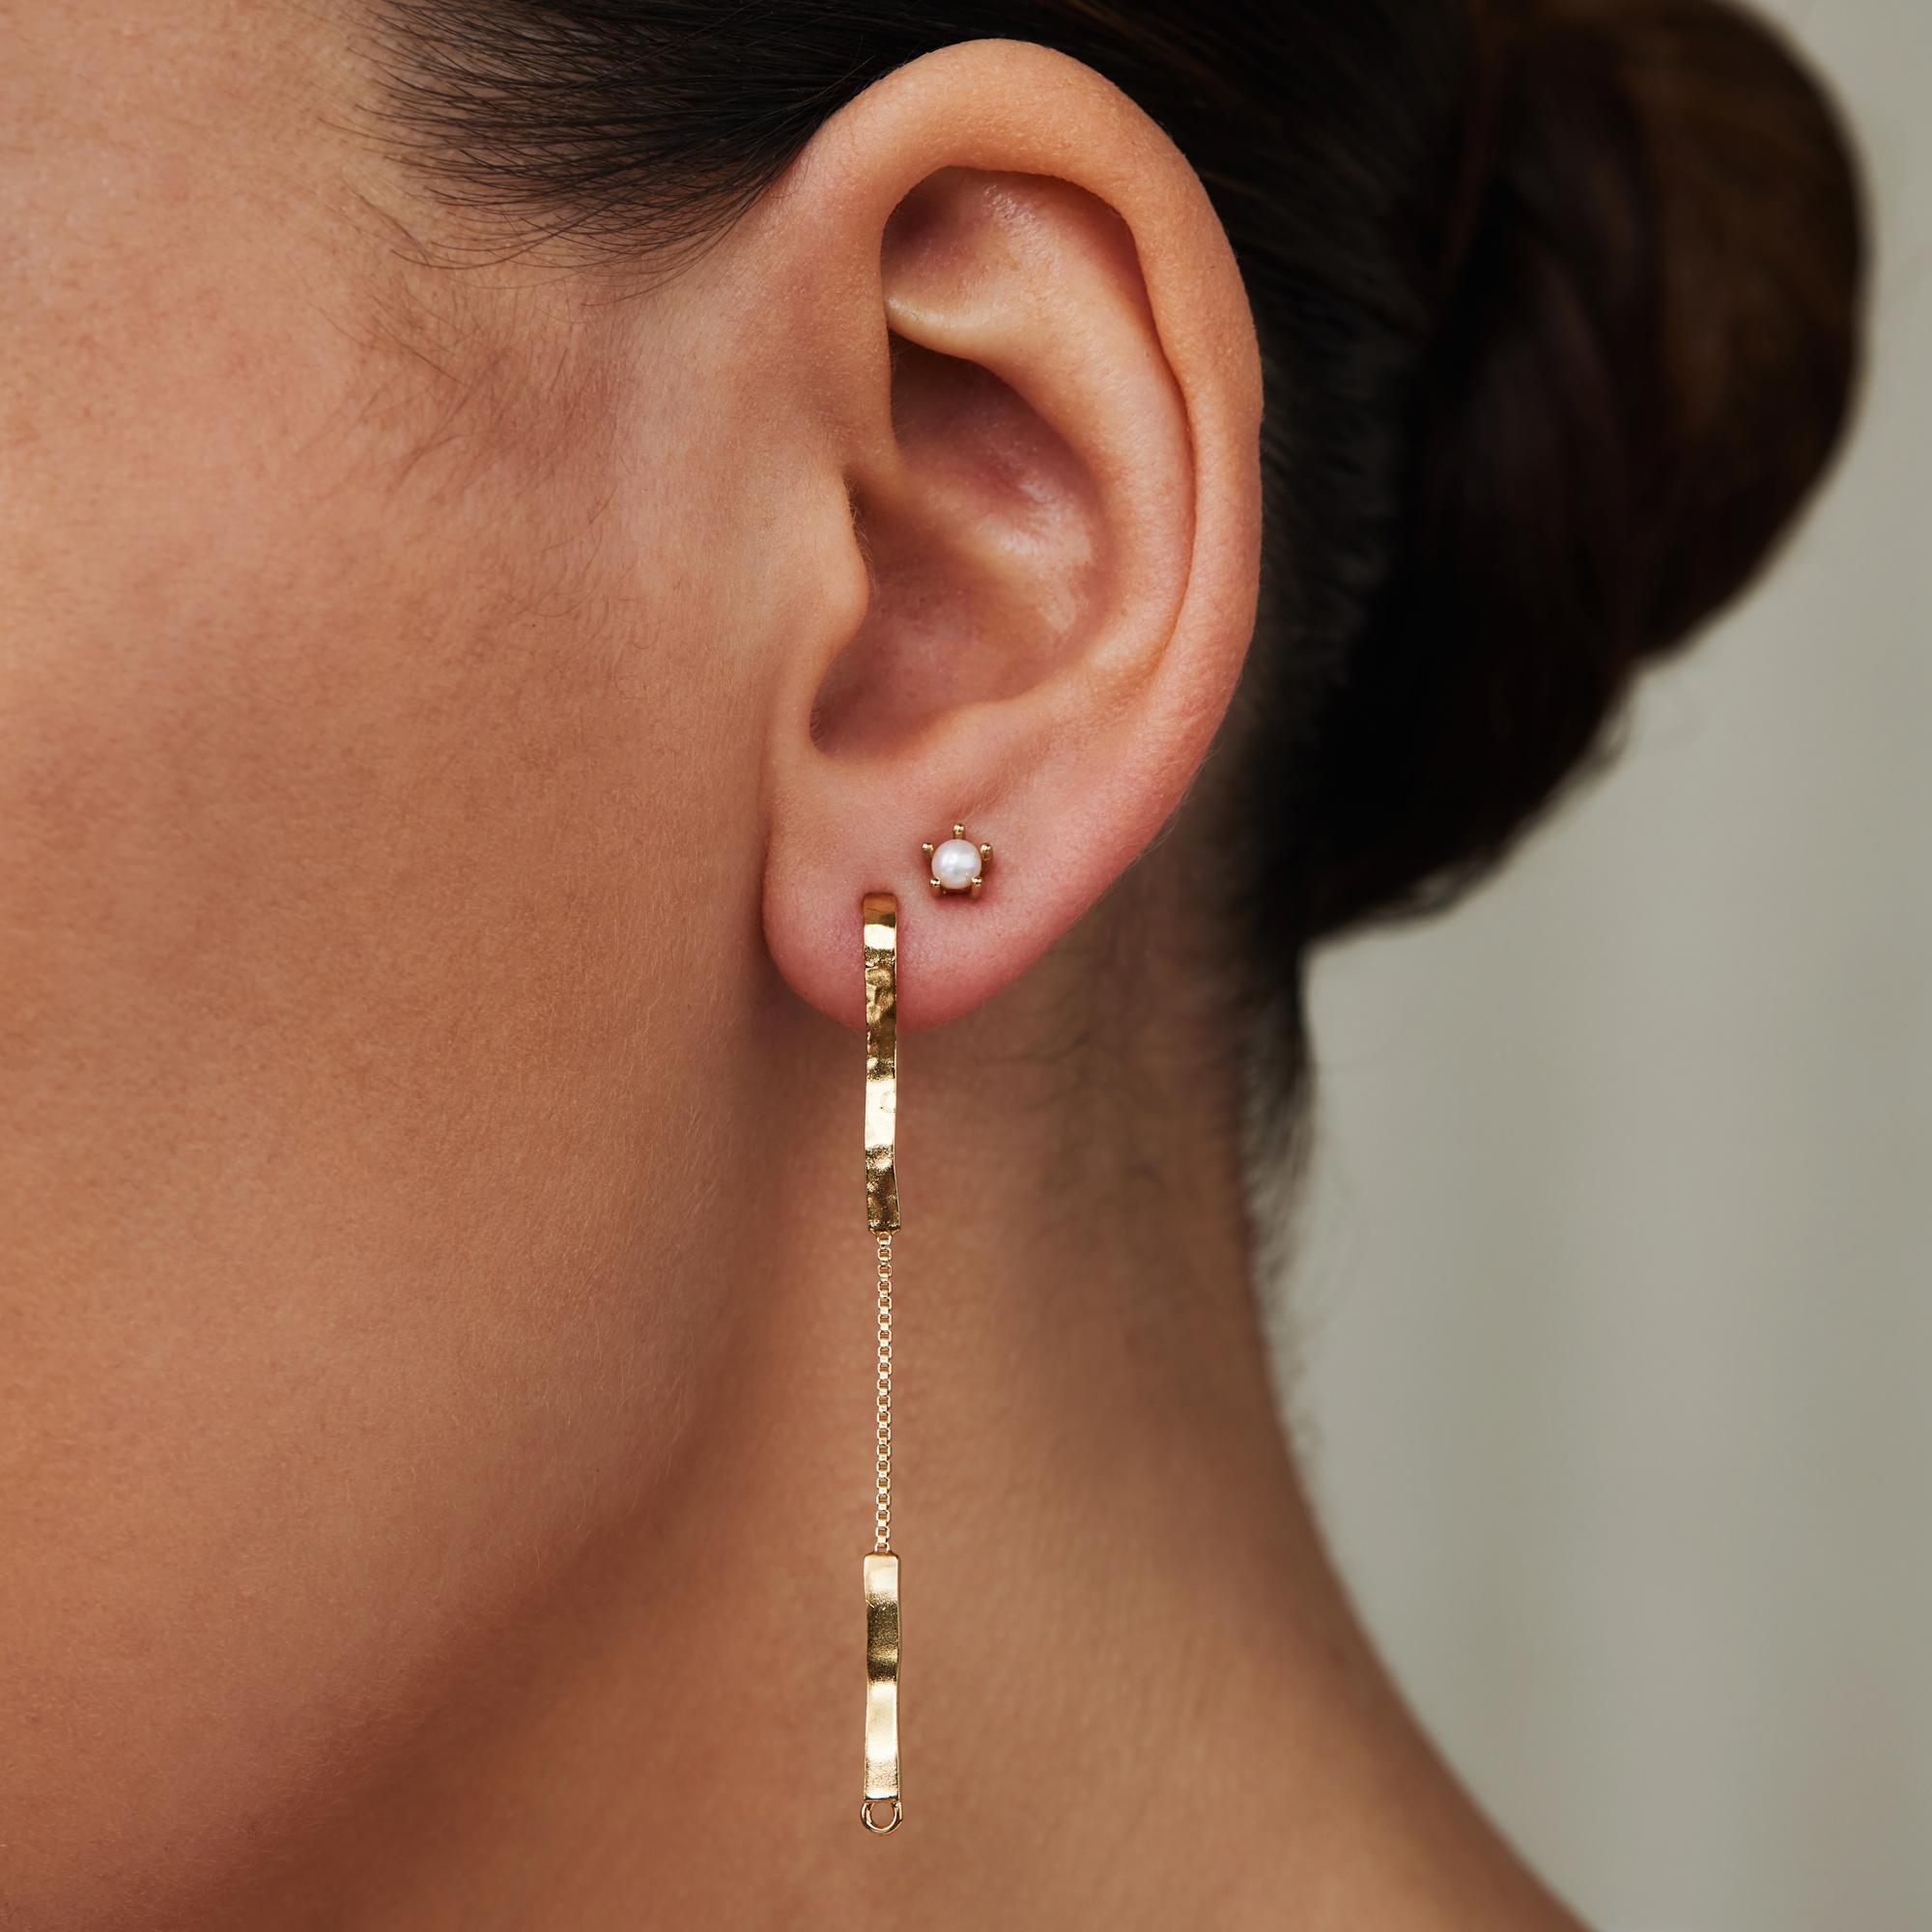 Violet Hamden Sisterhood Moonscape pendentifs d'oreille couleur or en argent sterling 925